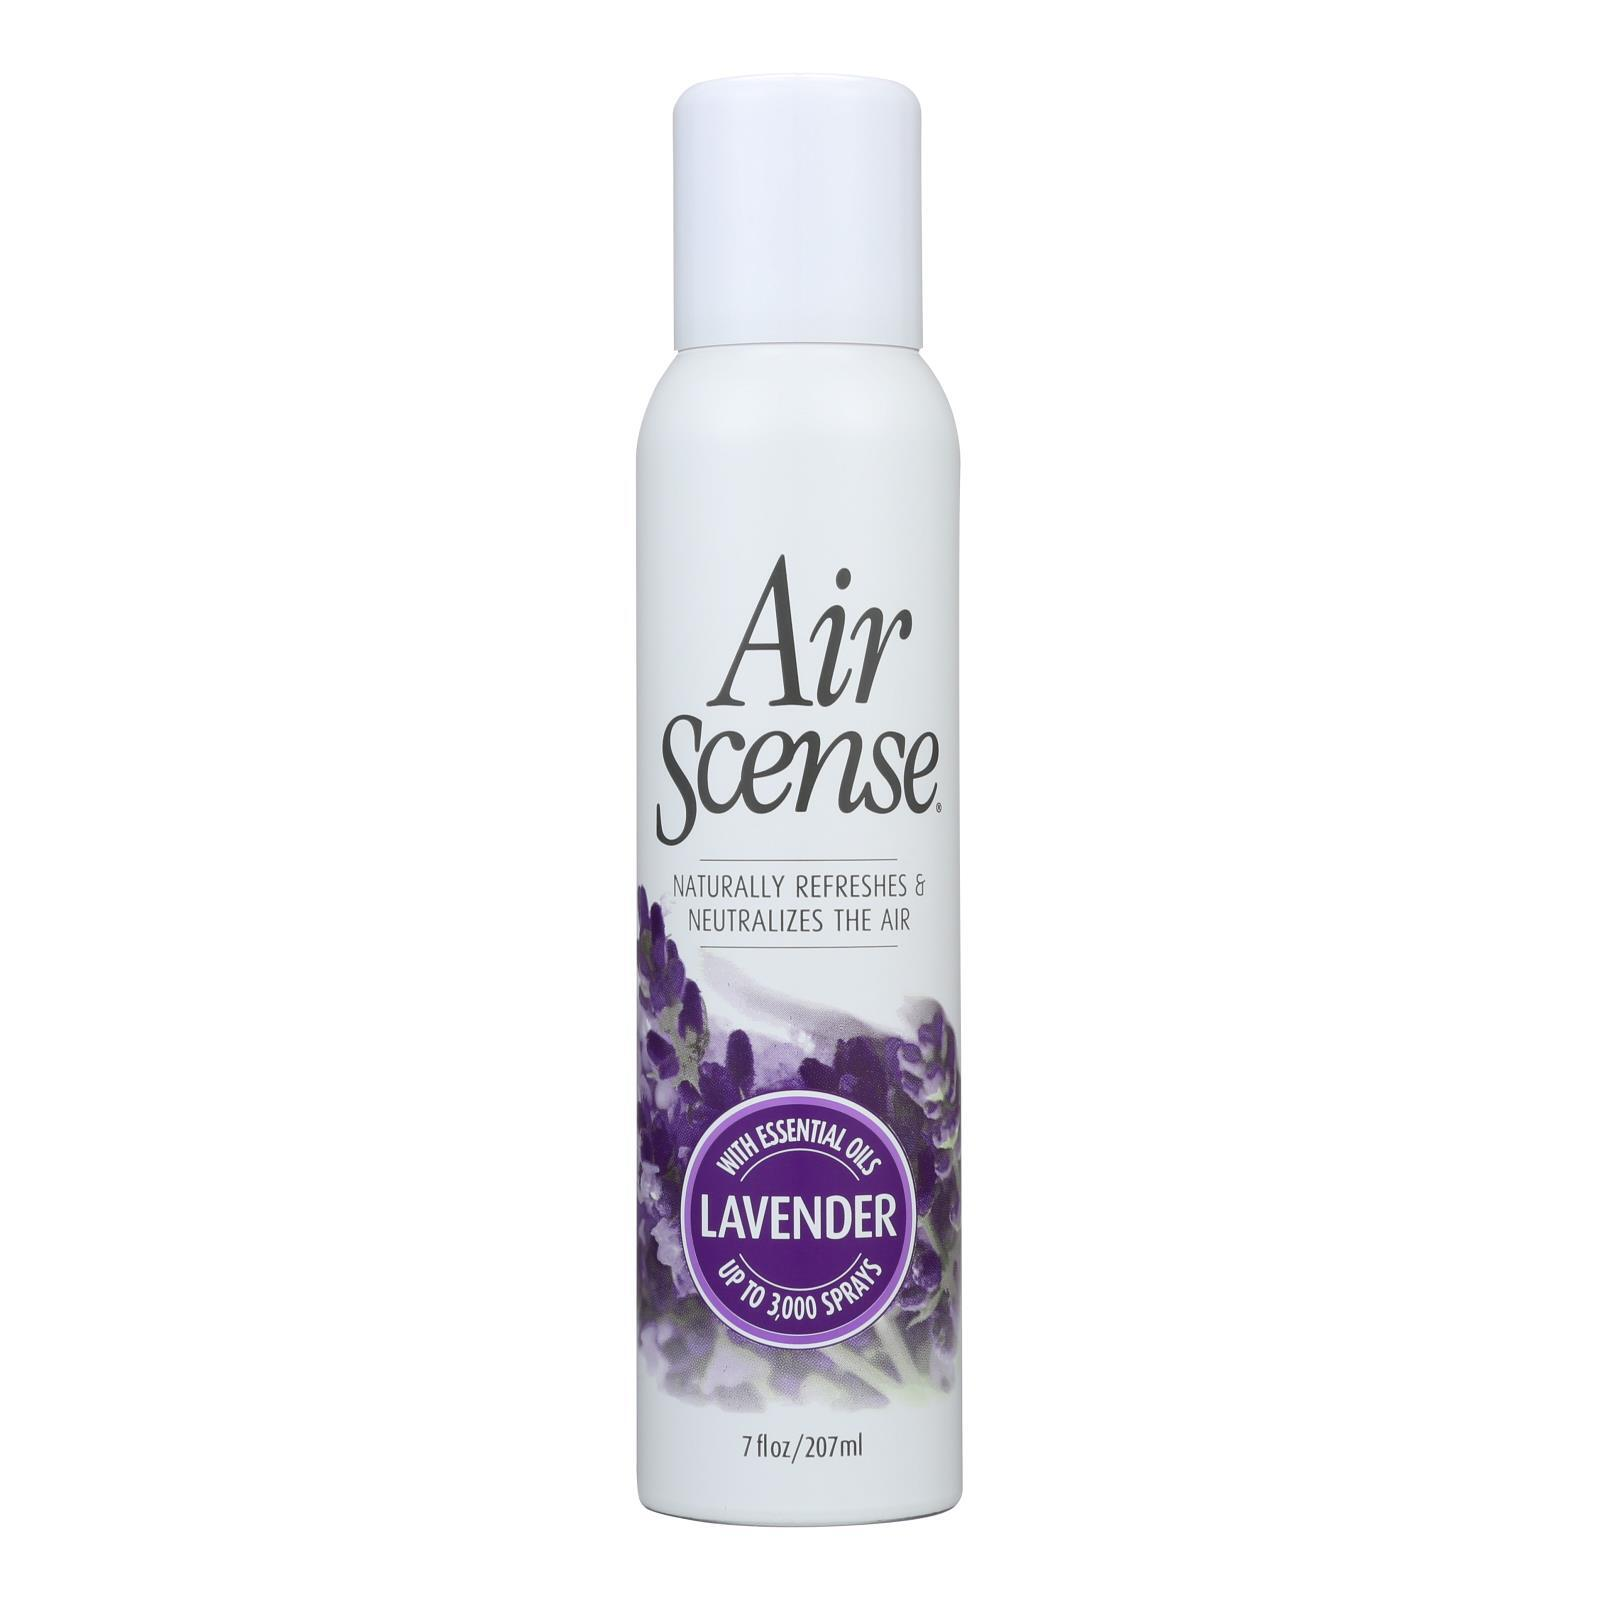 Air Scense Air Freshener - Lavender - Case of 4 - 7 oz